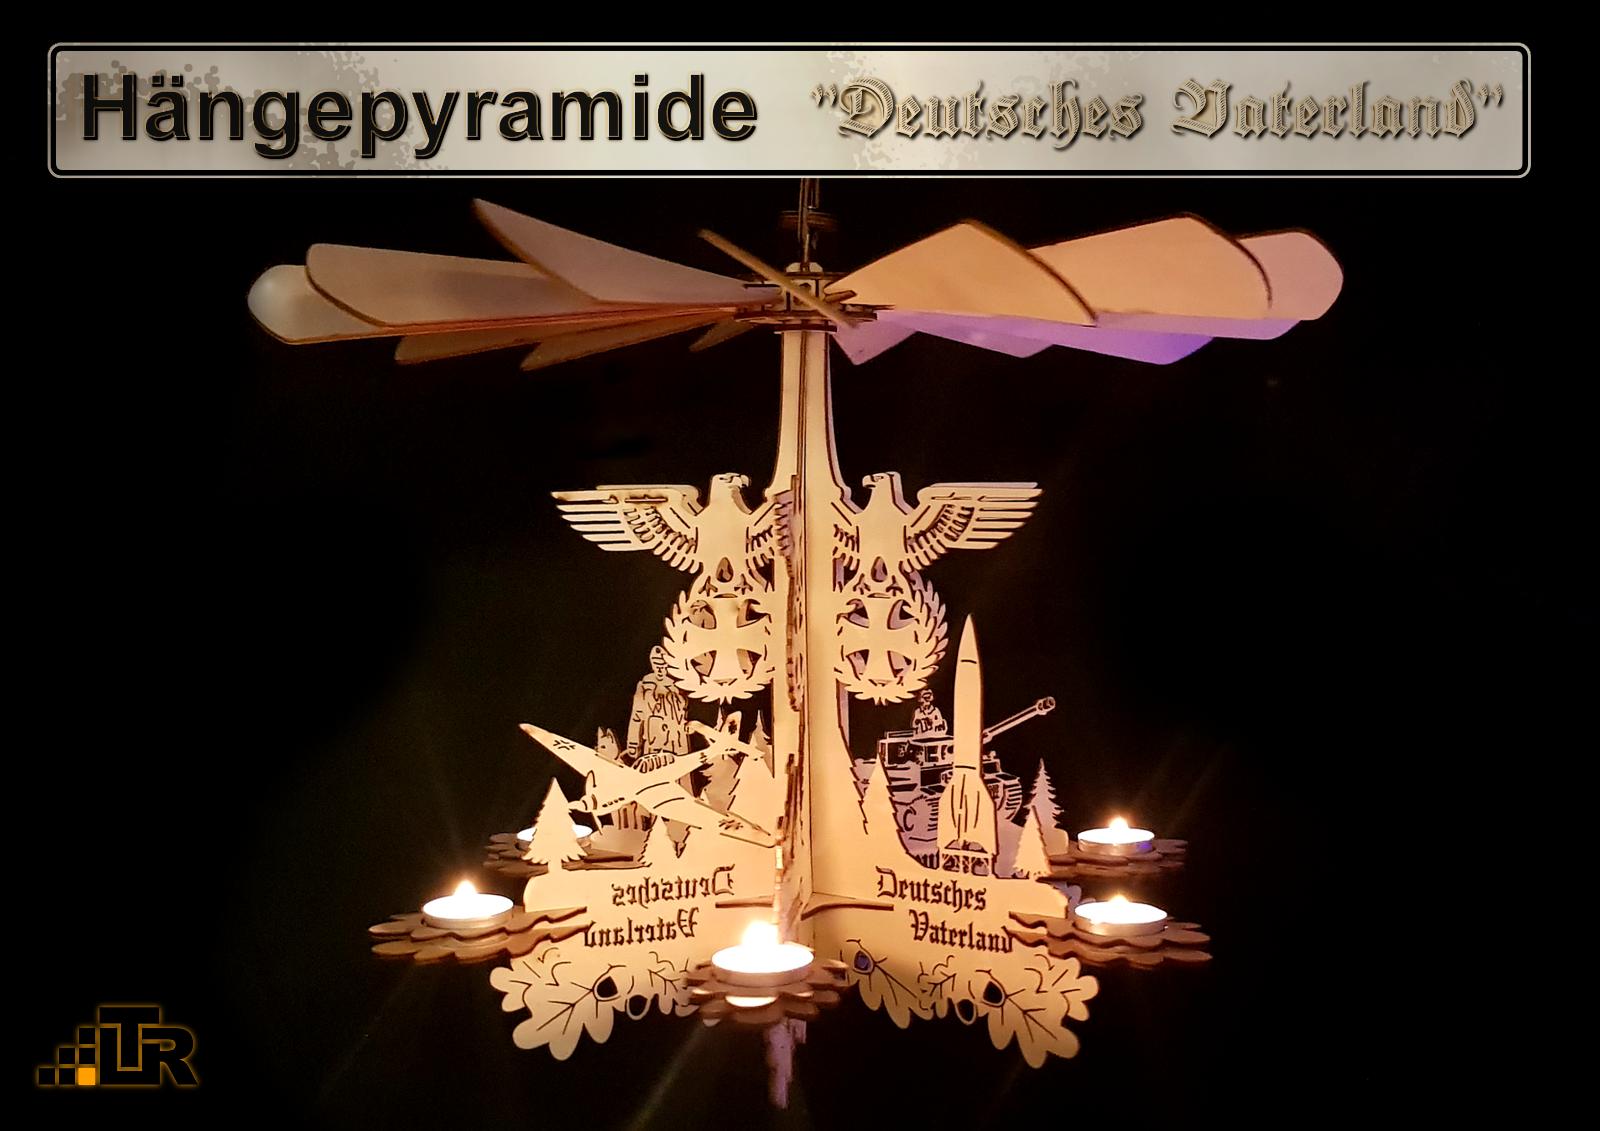 Hängepyramide Hängepyramide Hängepyramide - Deutsches Vaterland-Wärmespiel - Deko Militaria ww2 7d2873